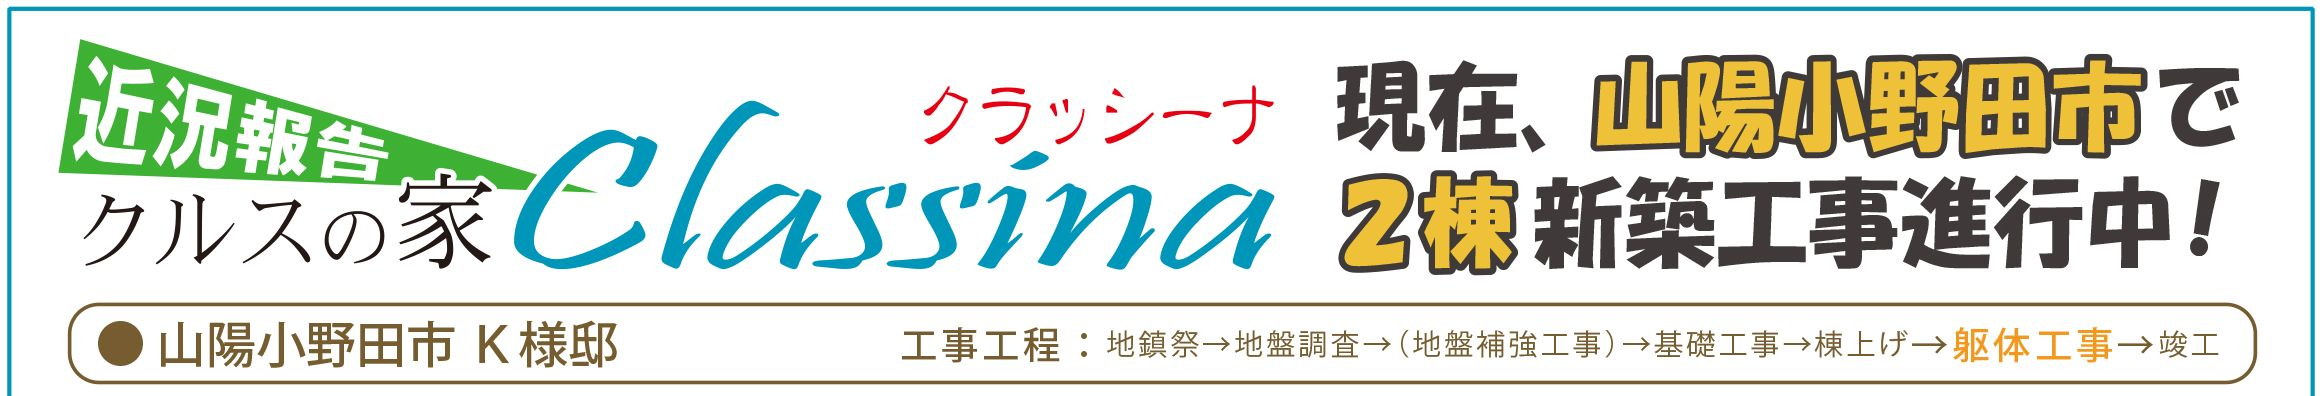 KuraSi-natu-sin99-02.jpg